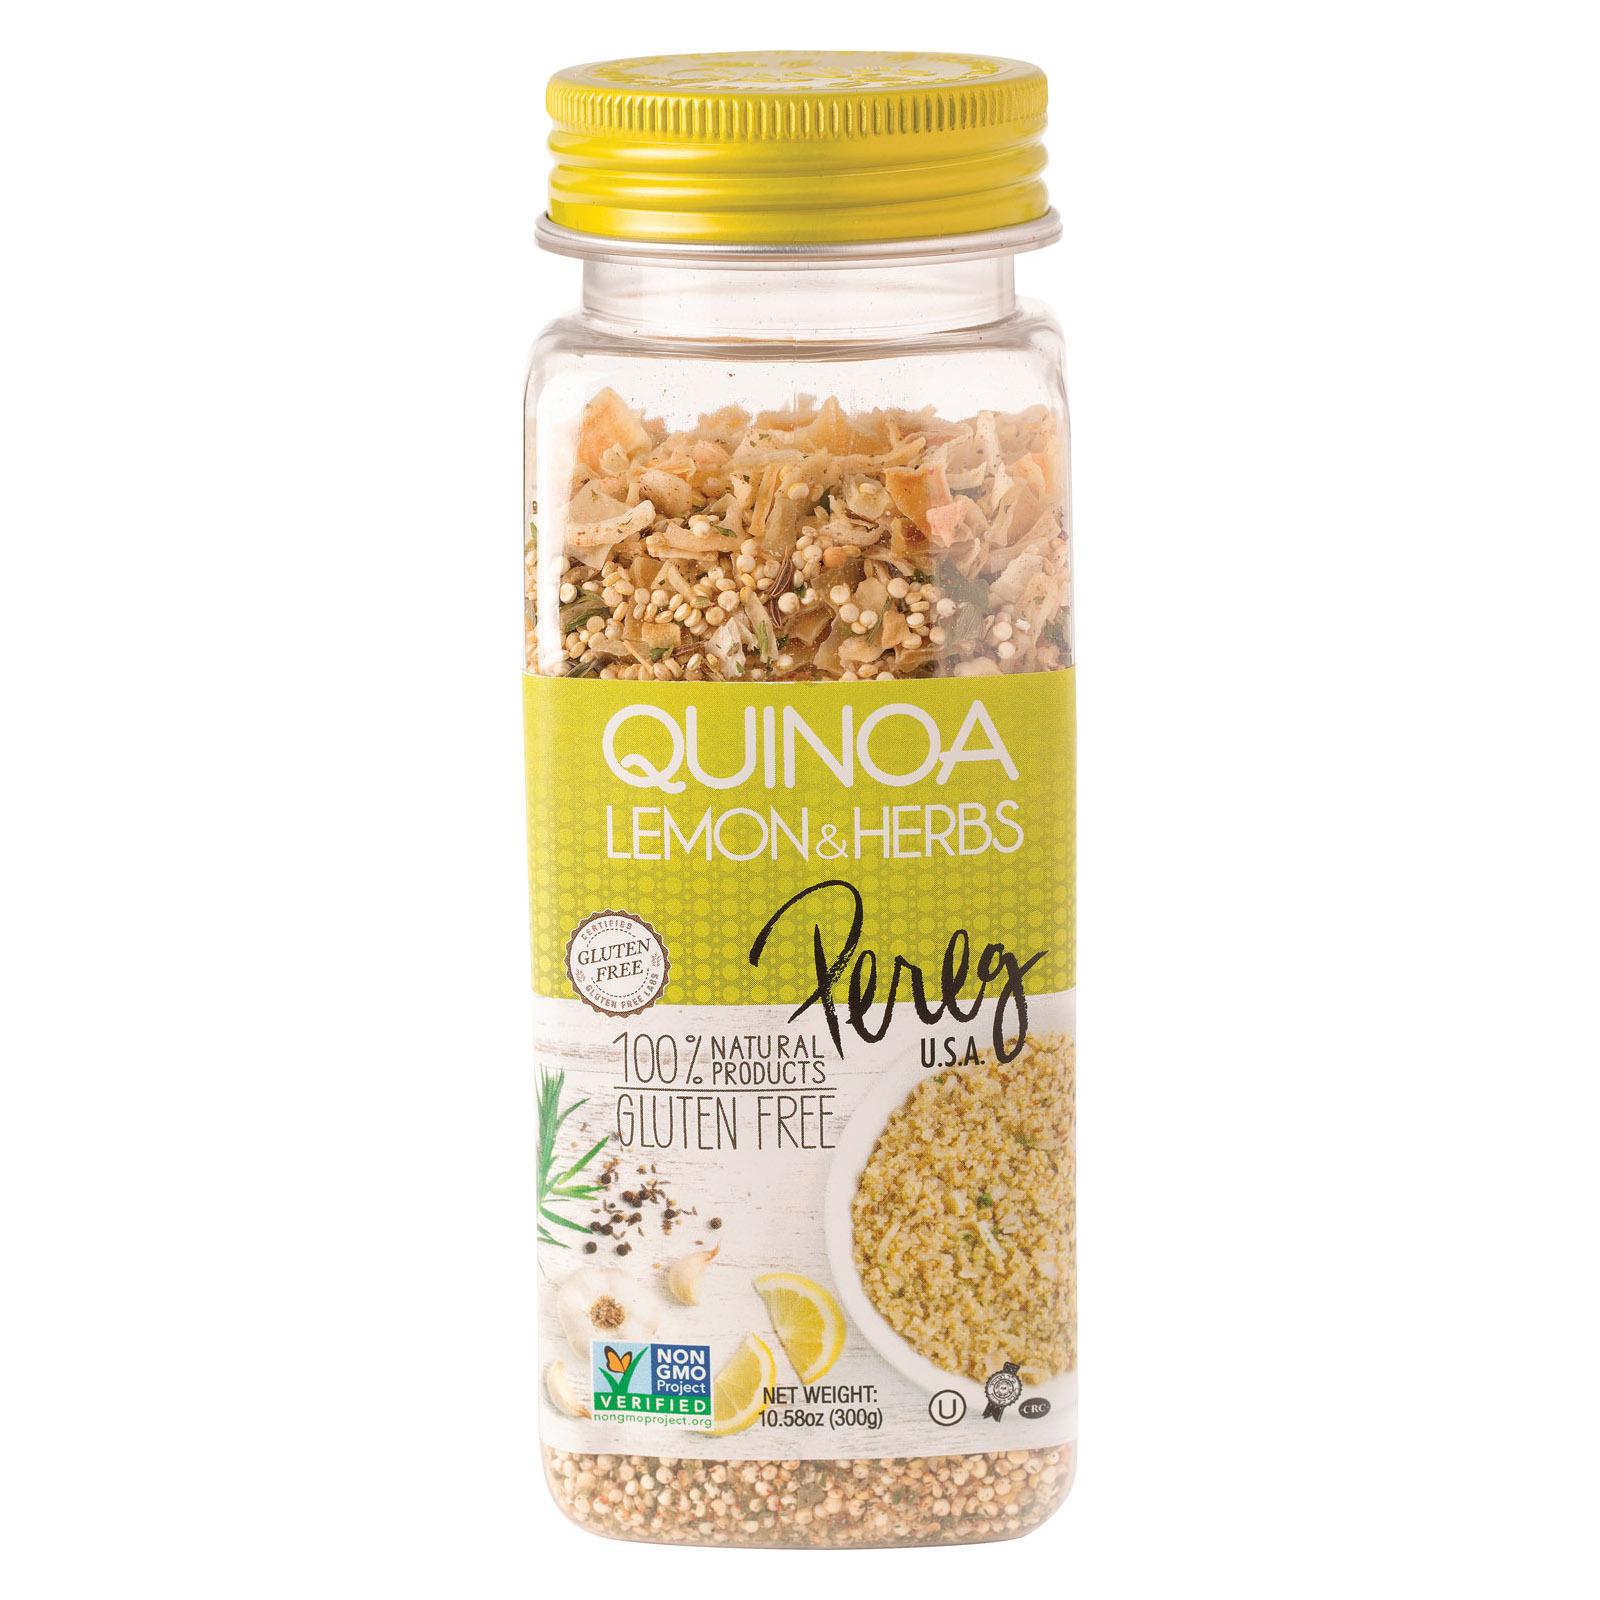 Pereg Quinoa - Lemon and Herbs - Case of 6 - 10.58 oz.